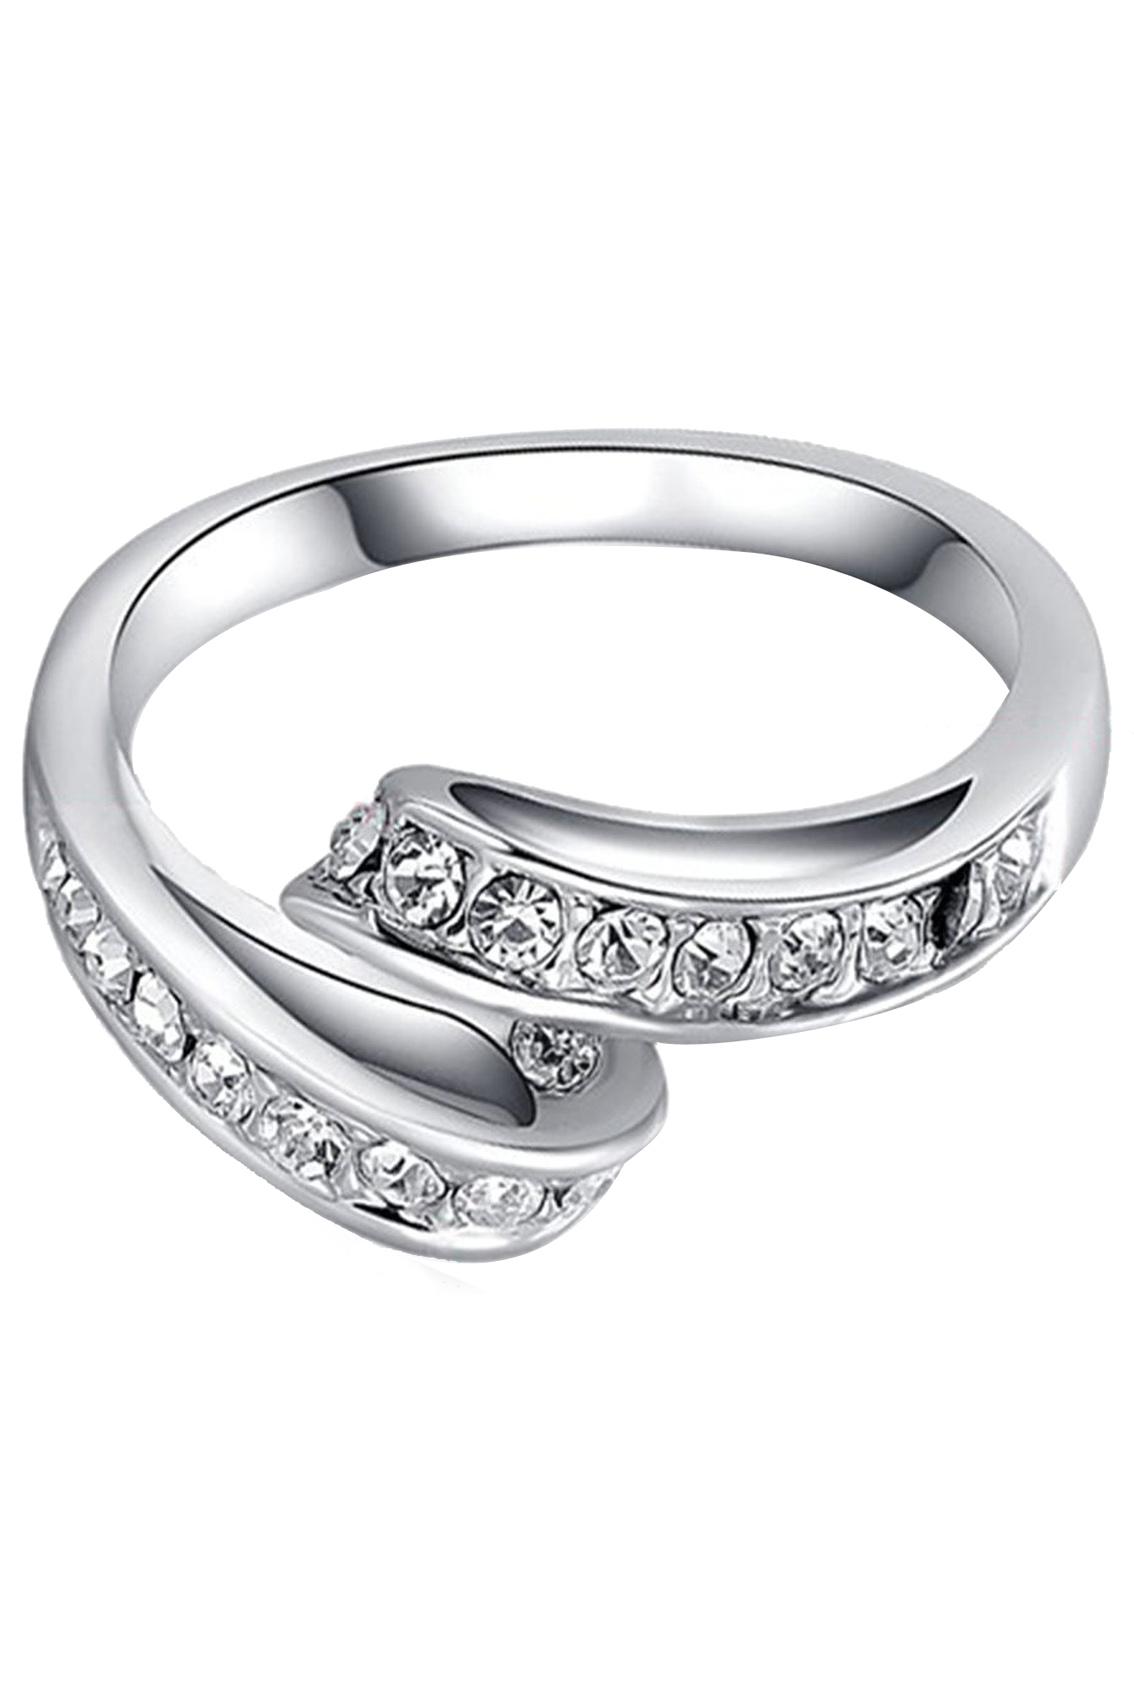 Women-039-s-sparkling-crystal-rhinestone-design-wedding-rings-jewelry-elegant-A4J6